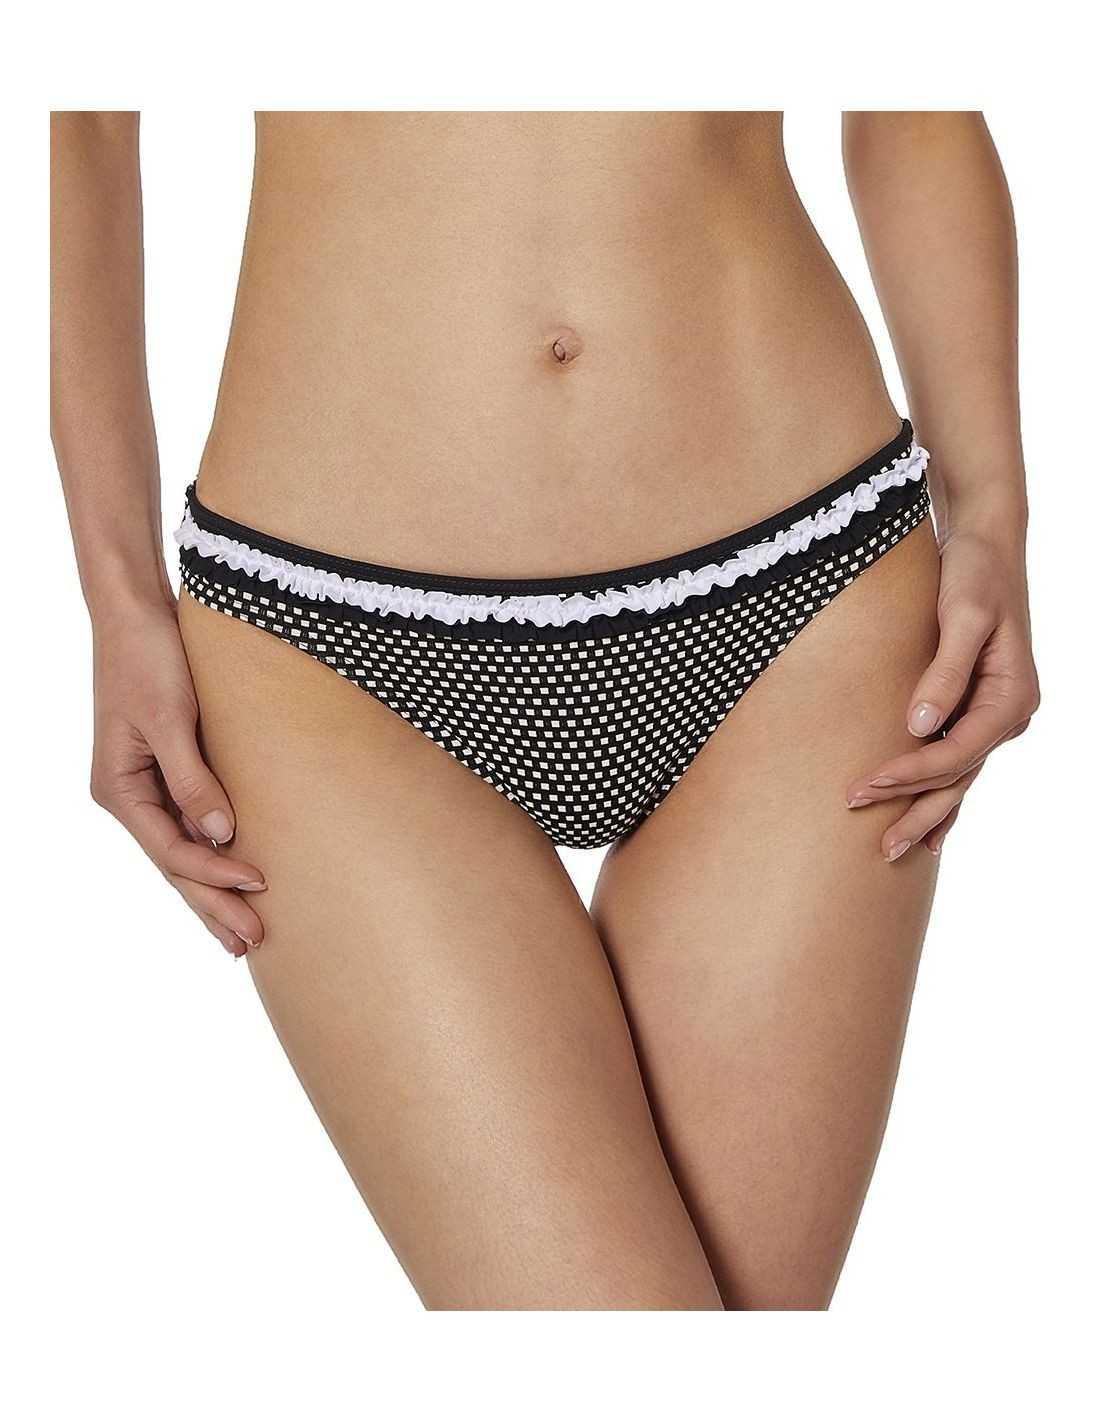 Braga bikini Onade de Red Point Carla COLOR: negro; TALLAS: 44, 46  - BAÑO  - PEPI GUERRA